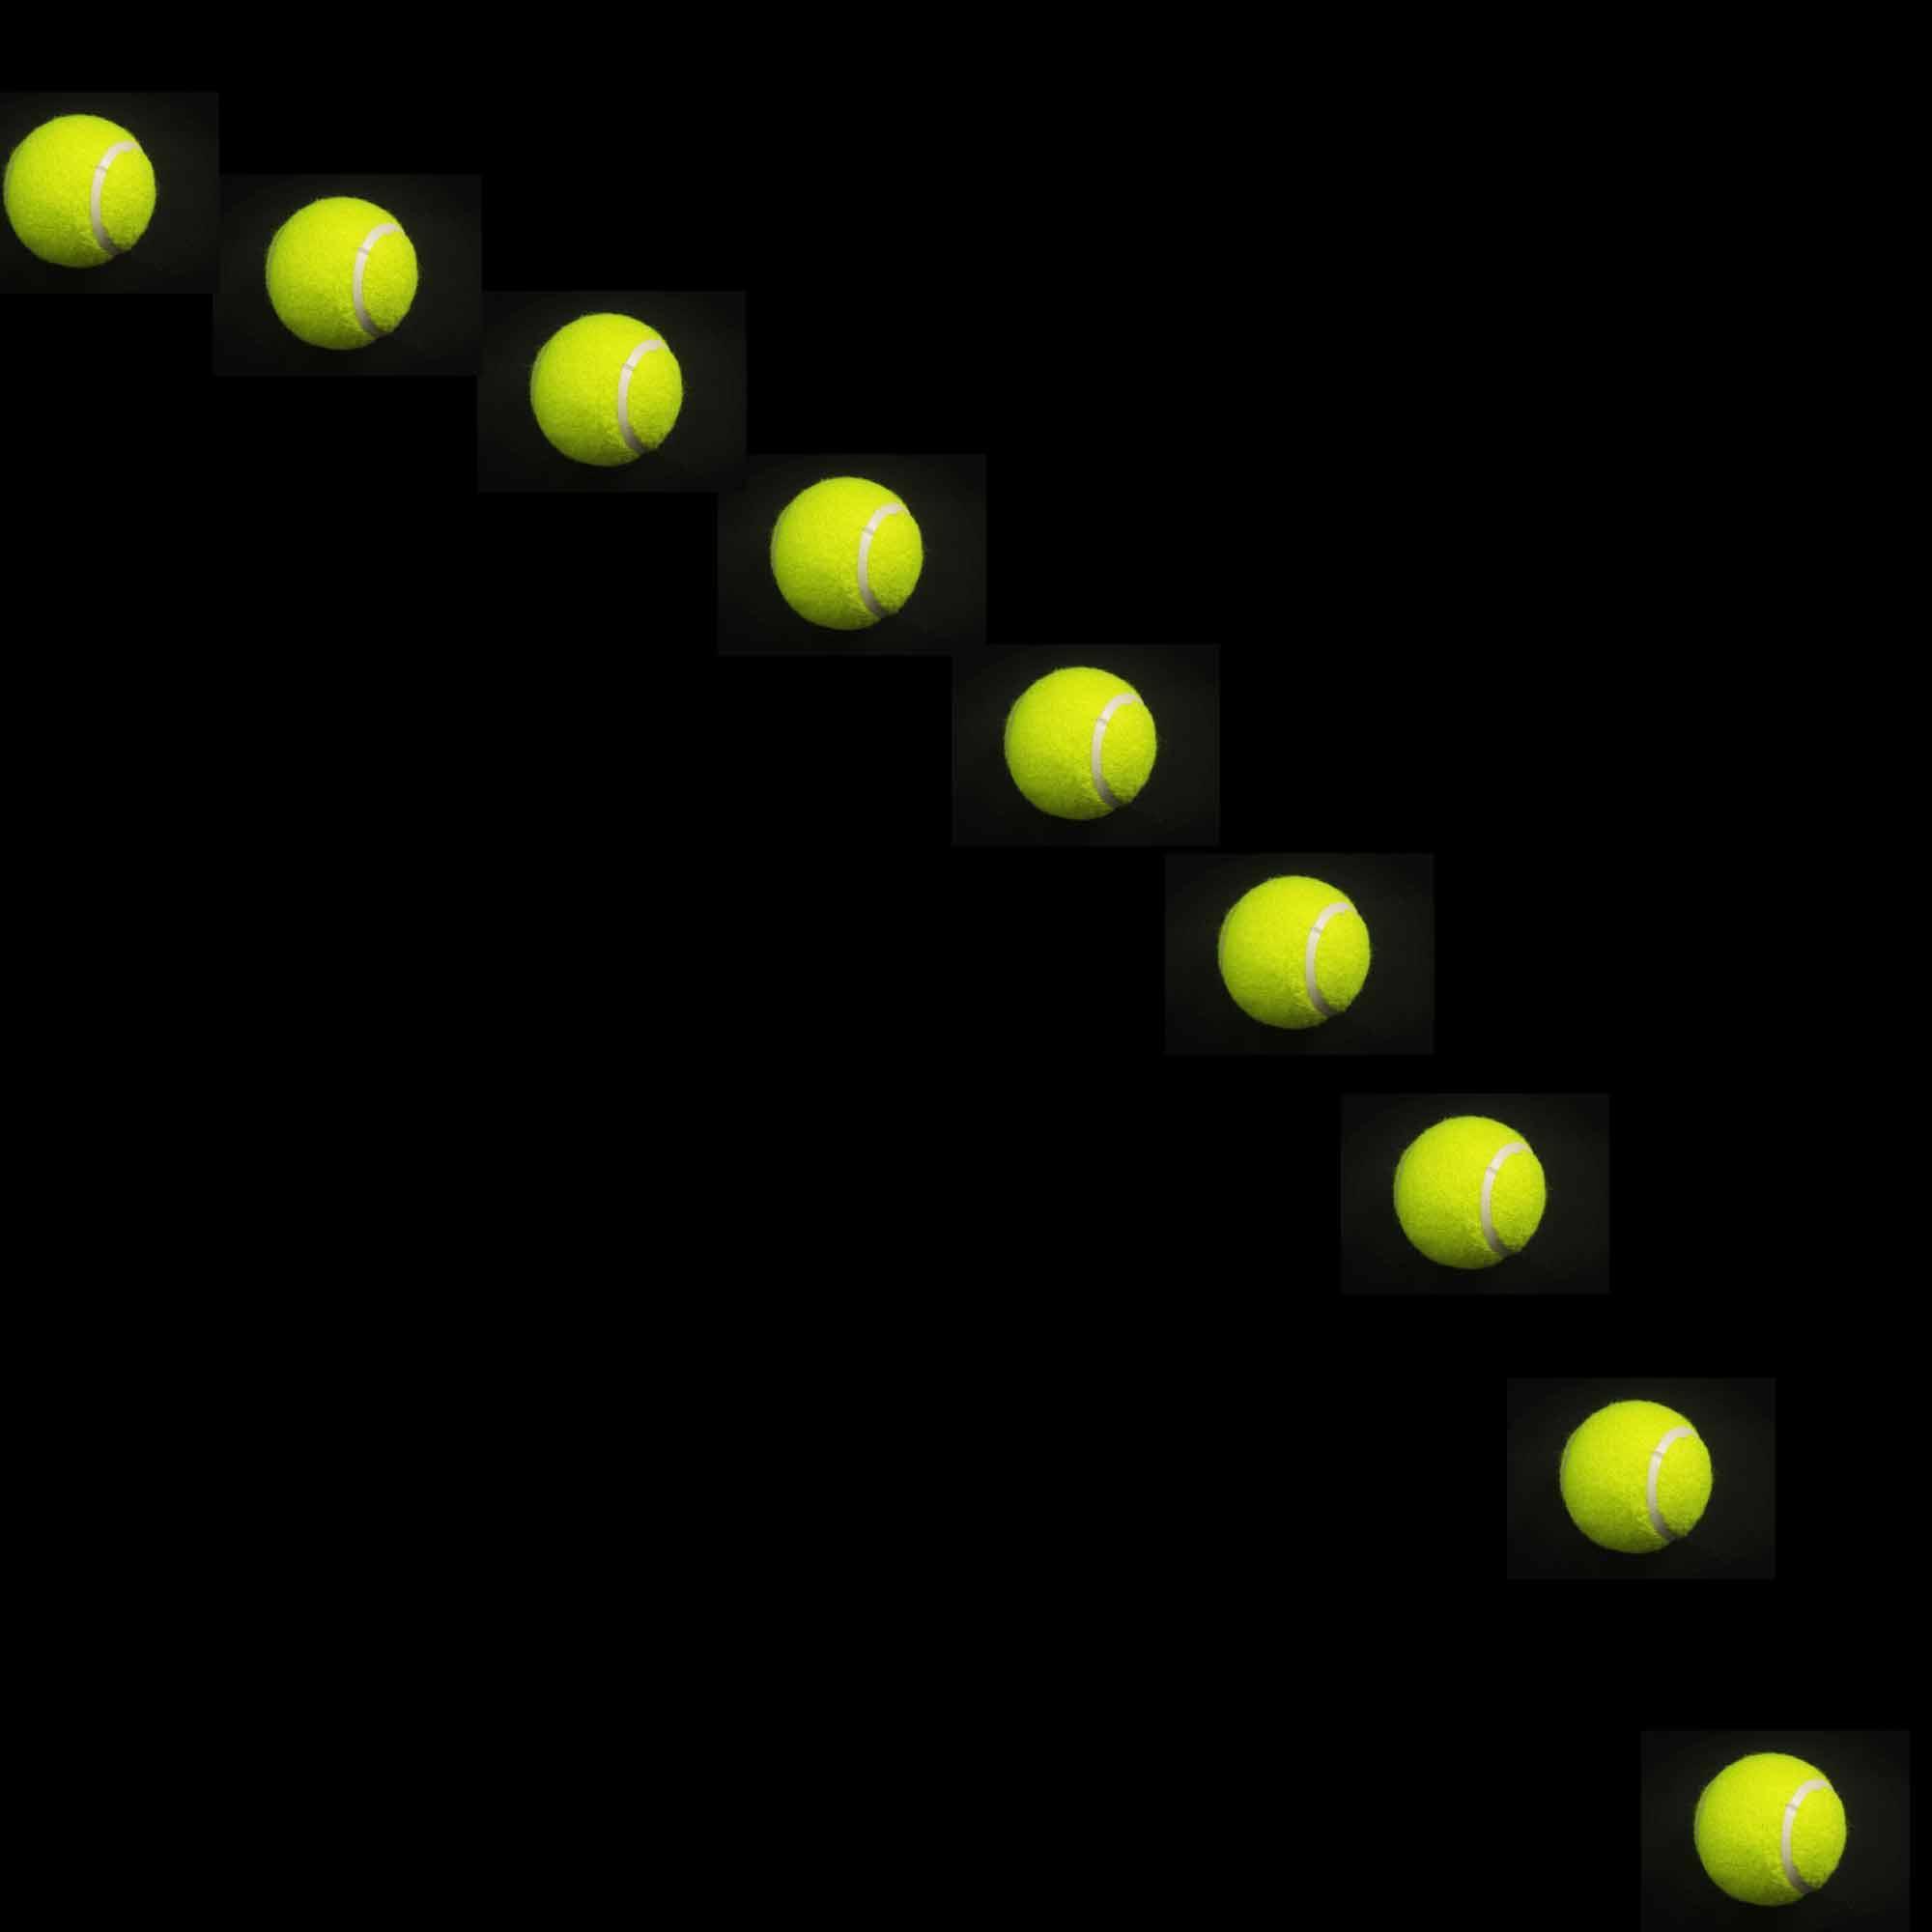 Flicker Free LED Lighting | Waveform Lighting